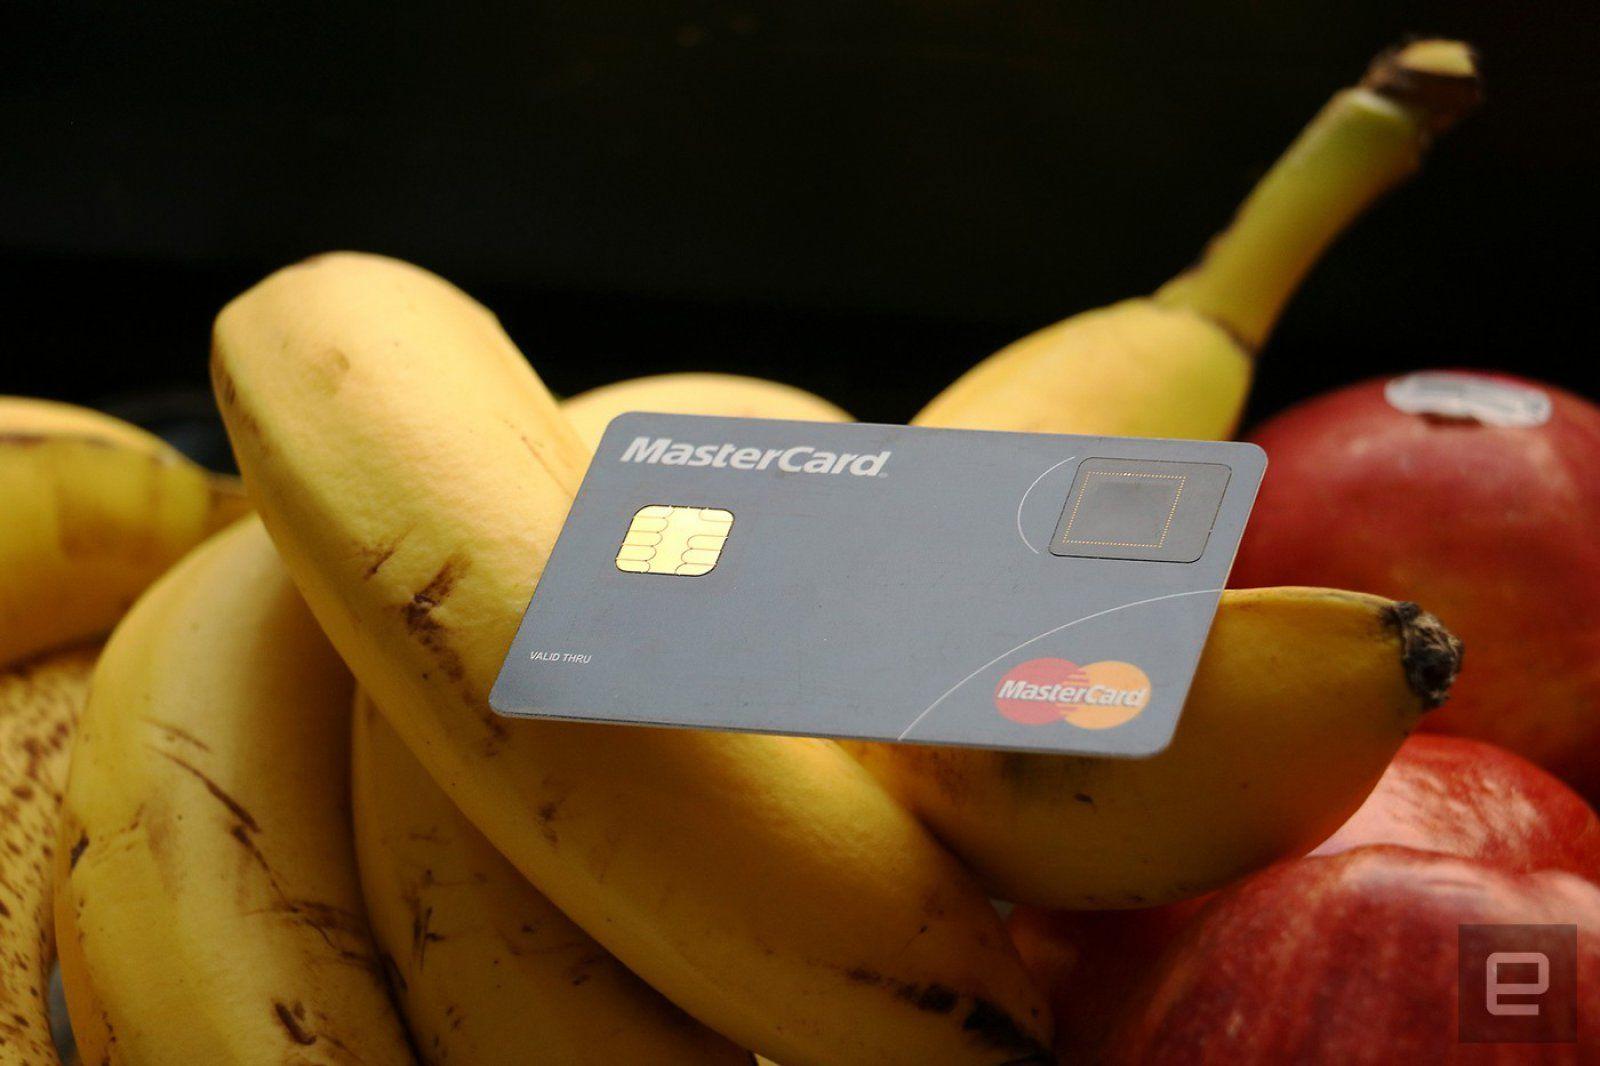 Biometria. MasterCard ci mette l'impronta